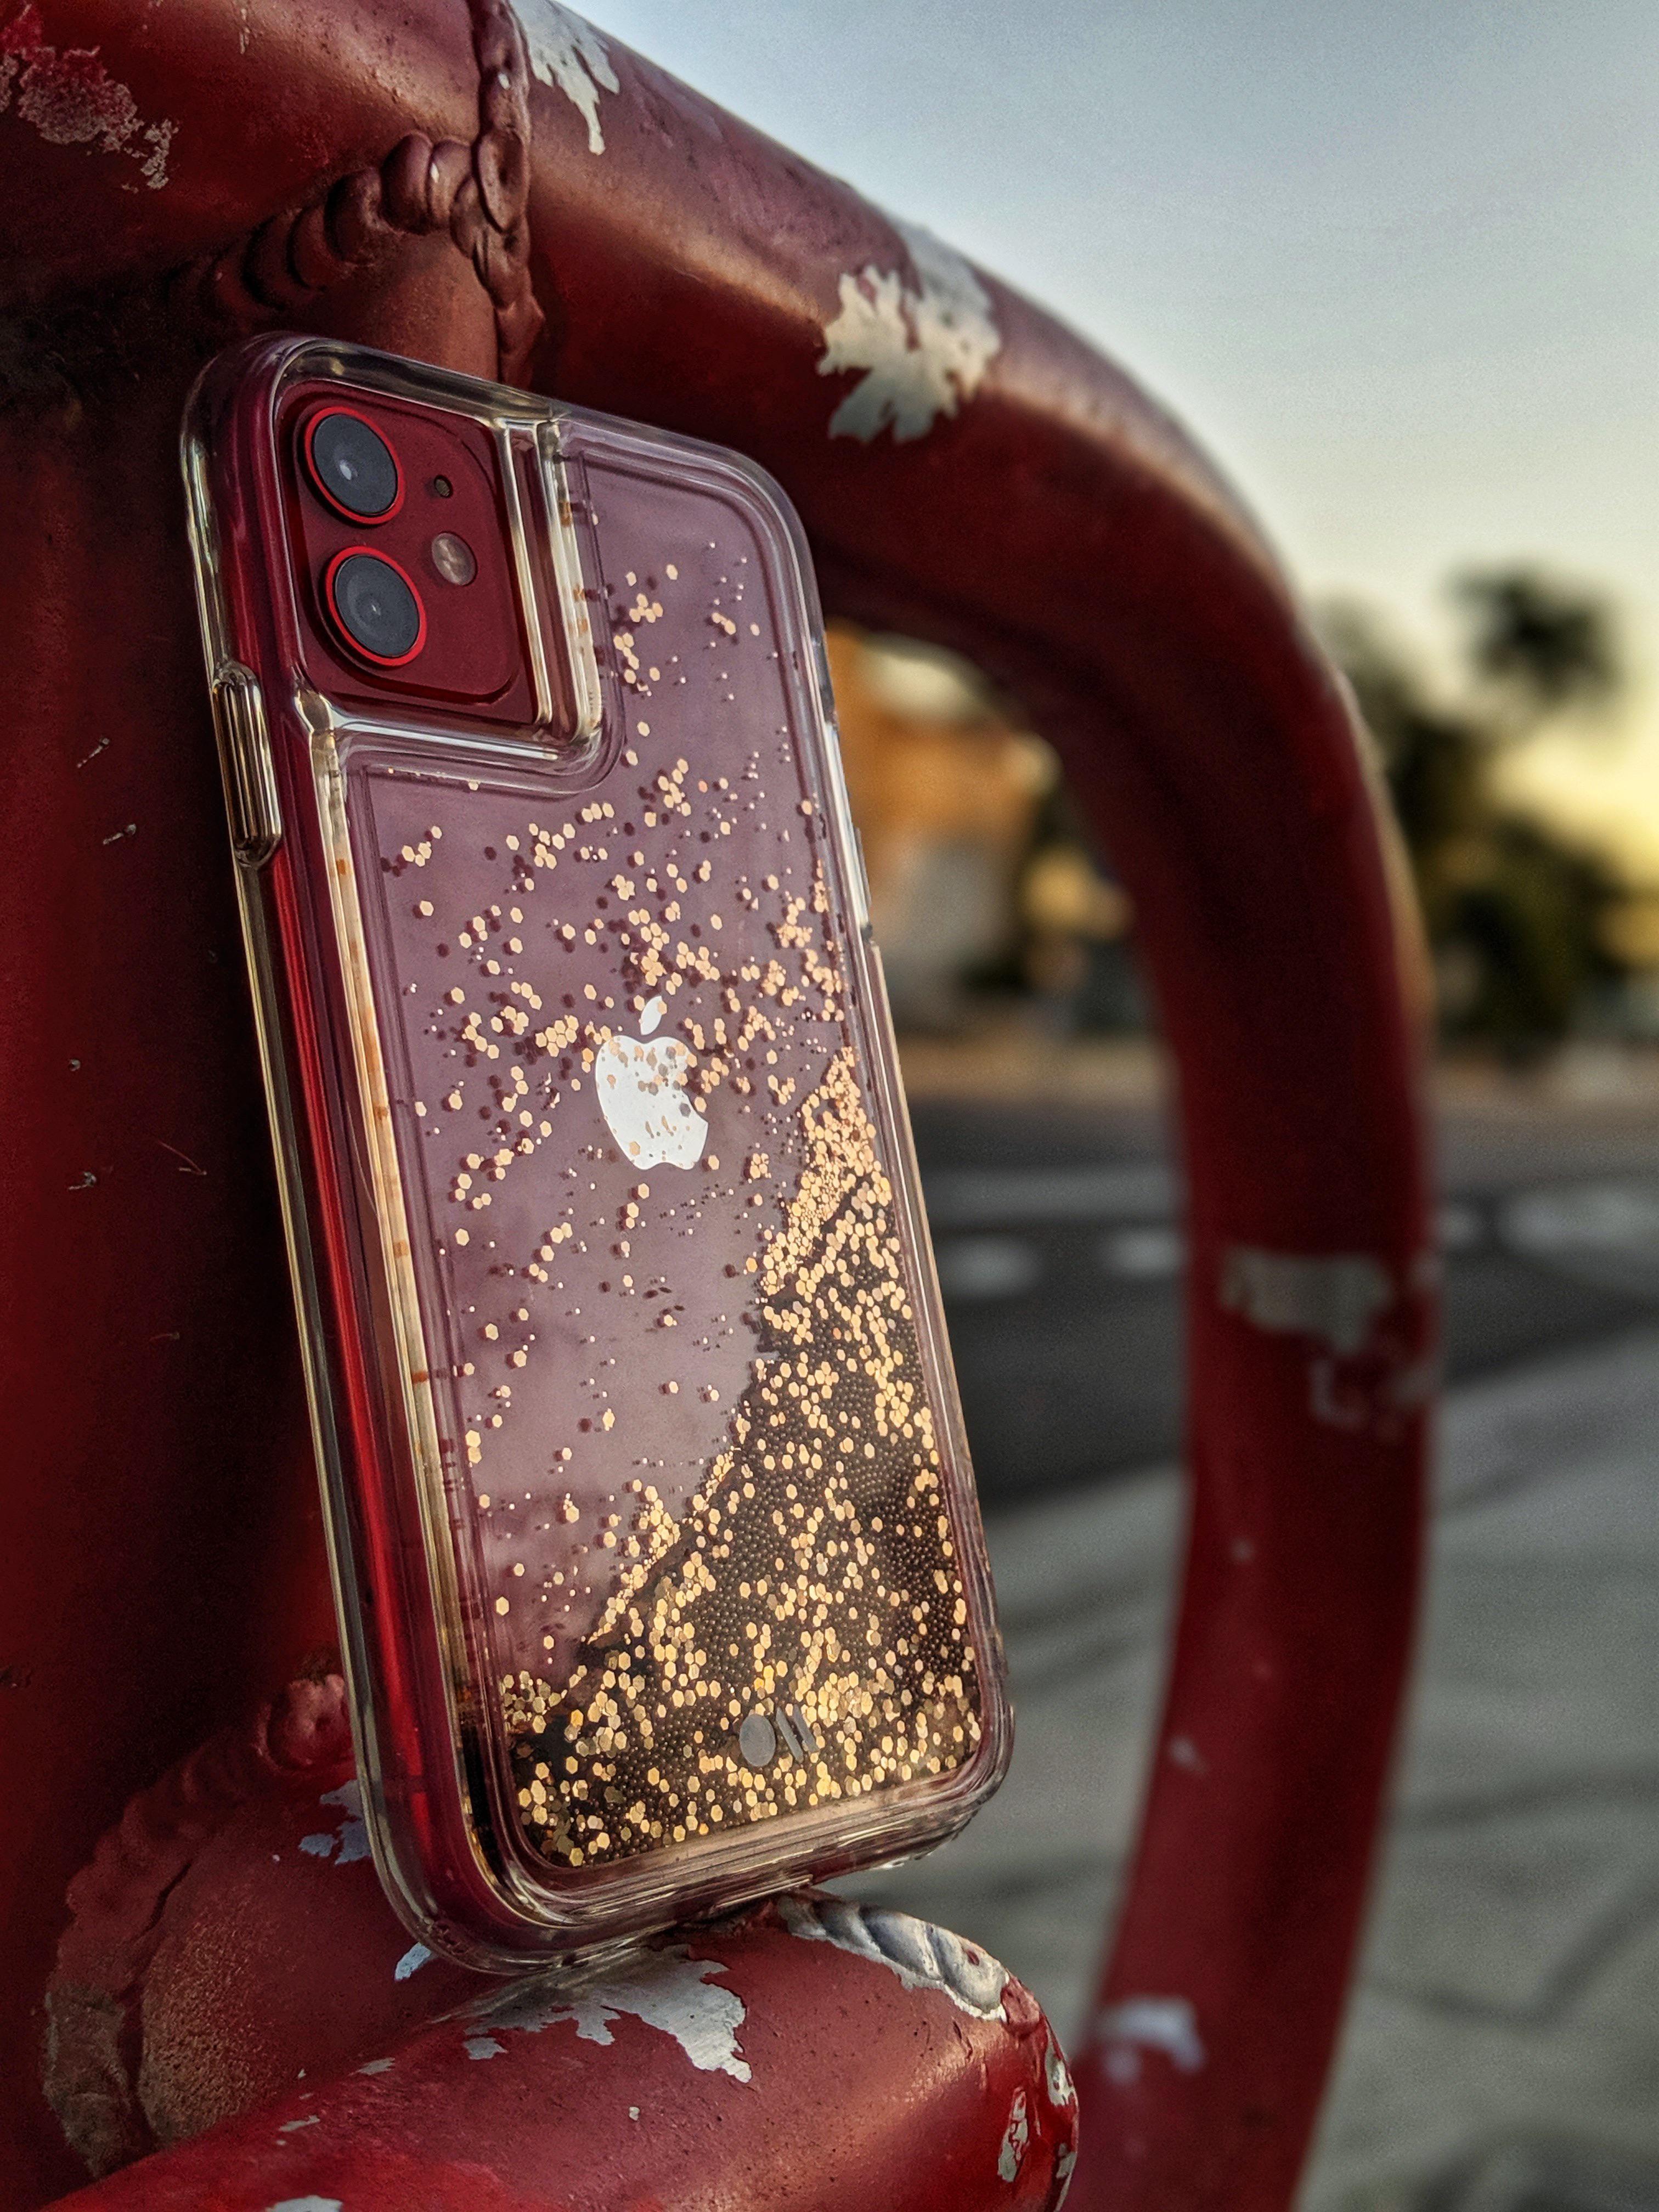 Red Iphone 11 Iphone Wallpaper Hd Original Iphone 11 Iphone